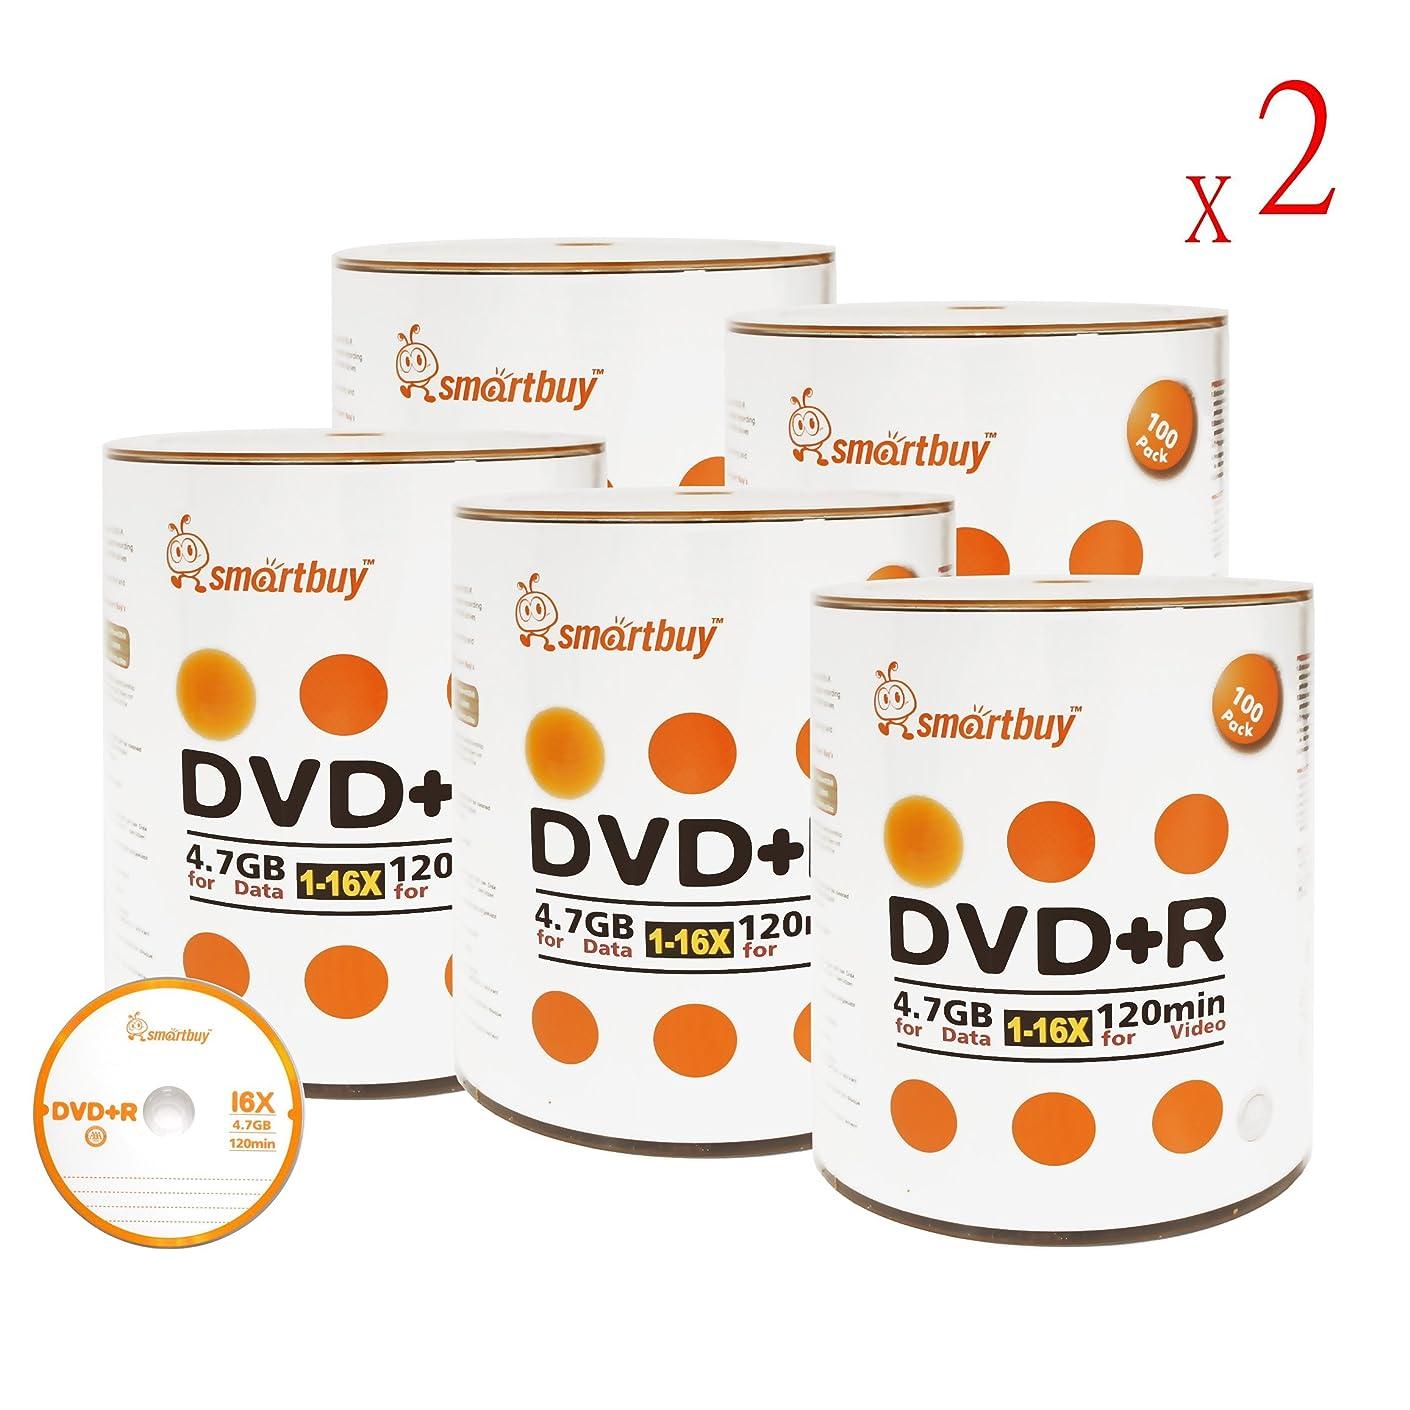 Smartbuy 4.7gb/120min 16x DVD+R Logo Top Blank Data Video Recordable Media Disc (1000-Disc)